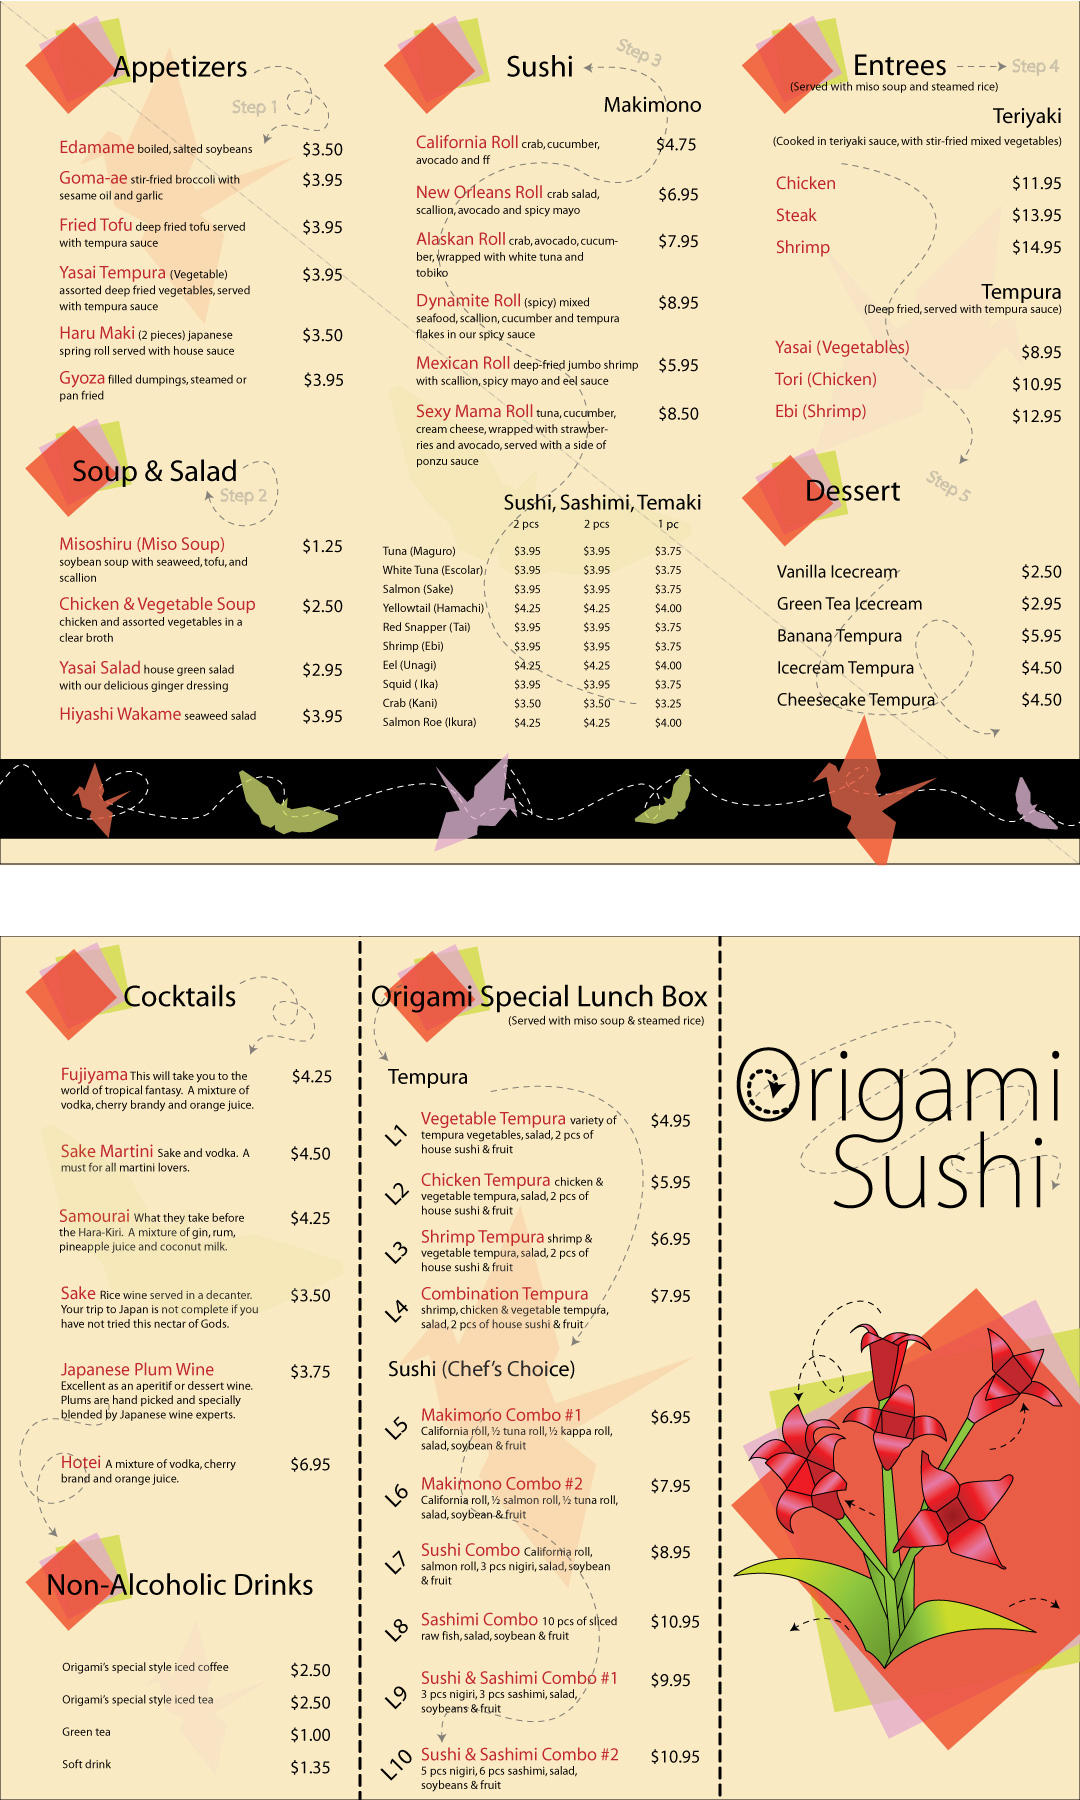 Origami Sushi Menu by cremetangerine on deviantART - photo#1